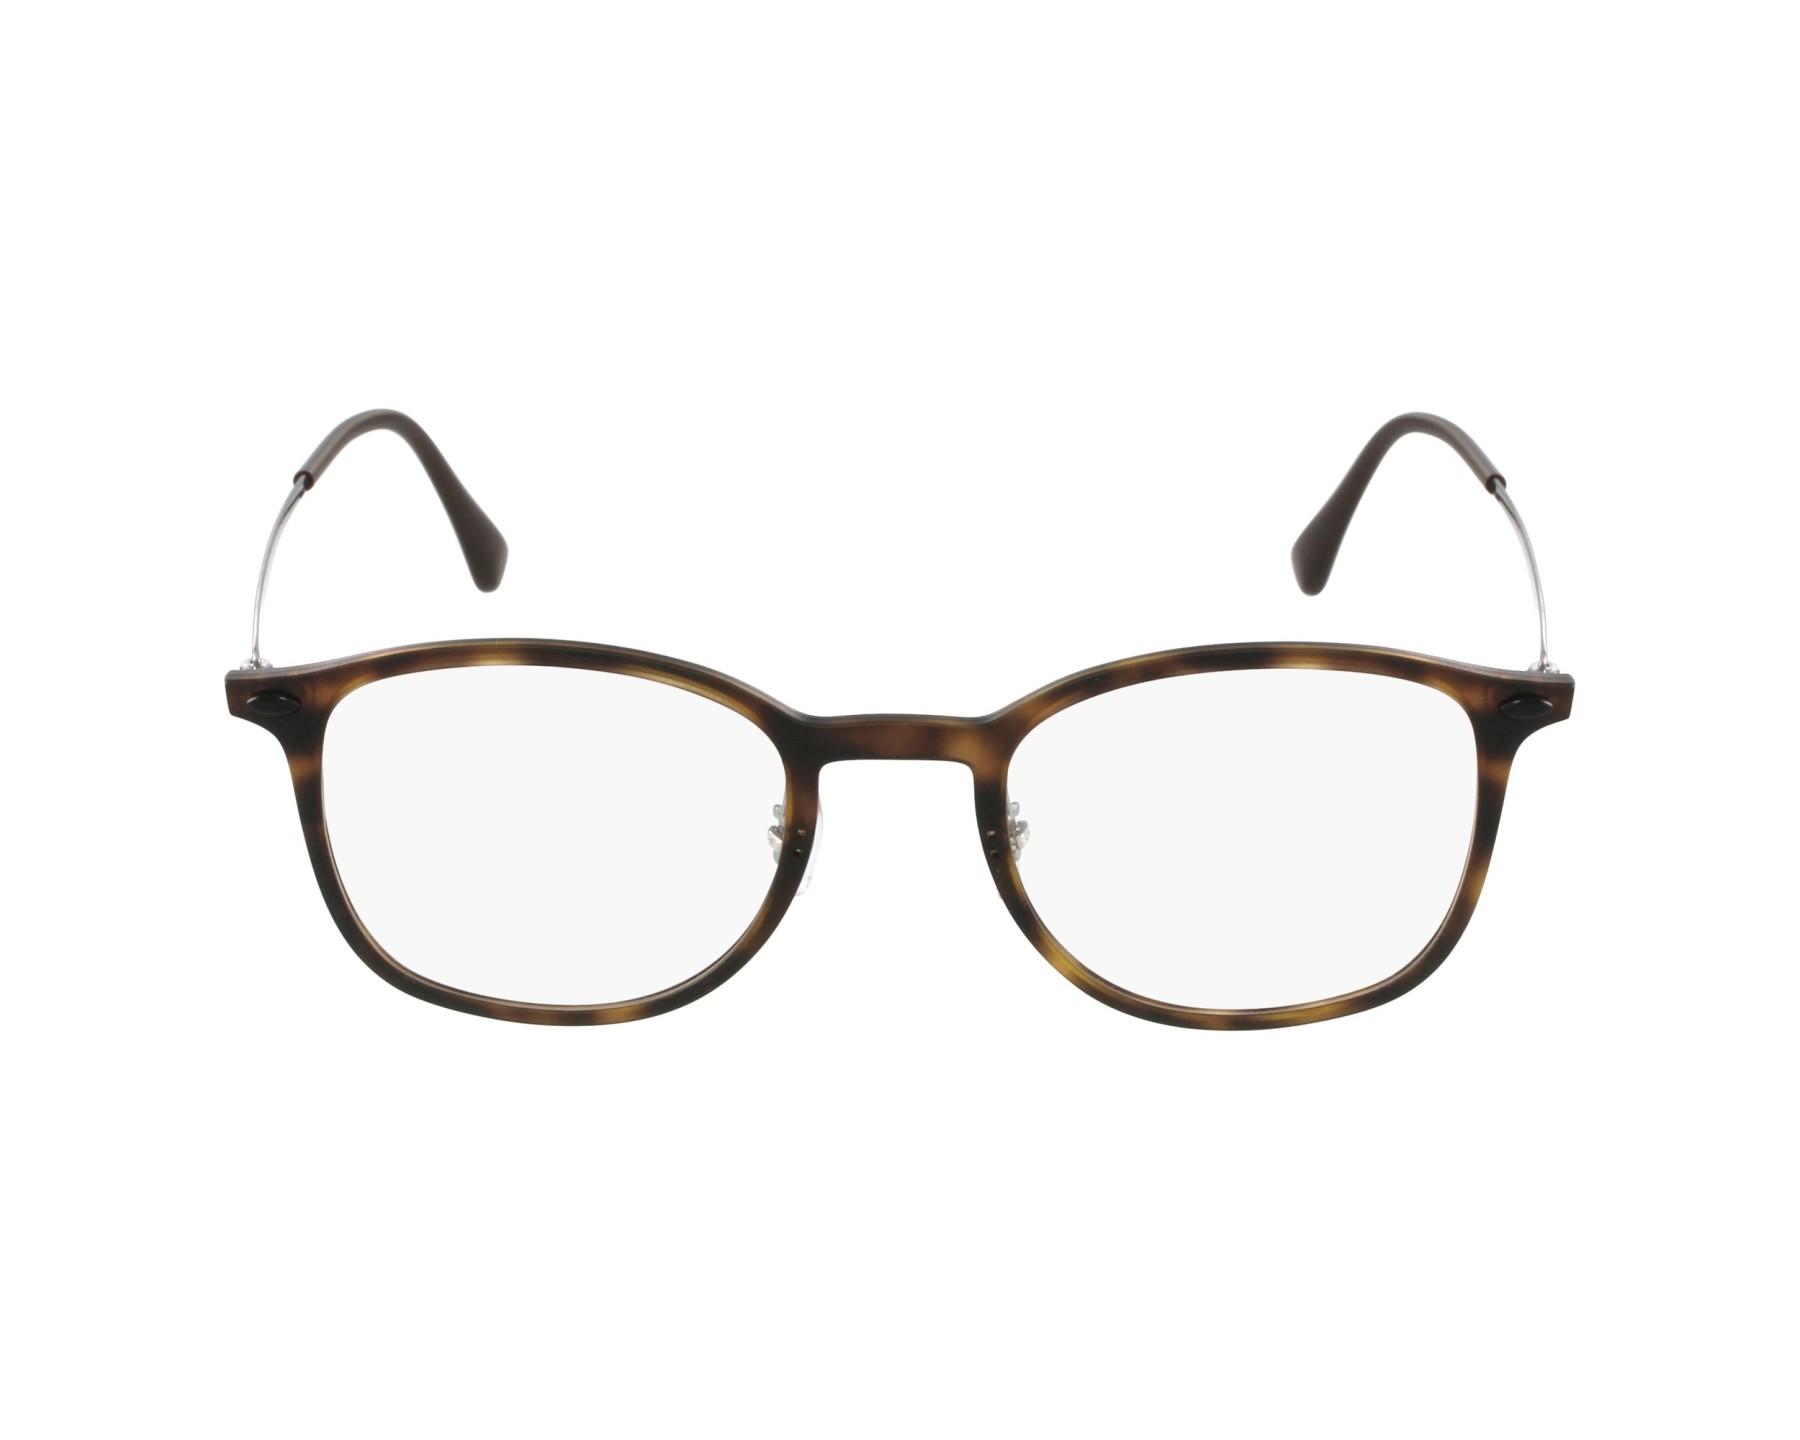 lunettes de vue ray ban rx 7051 5200 havane. Black Bedroom Furniture Sets. Home Design Ideas